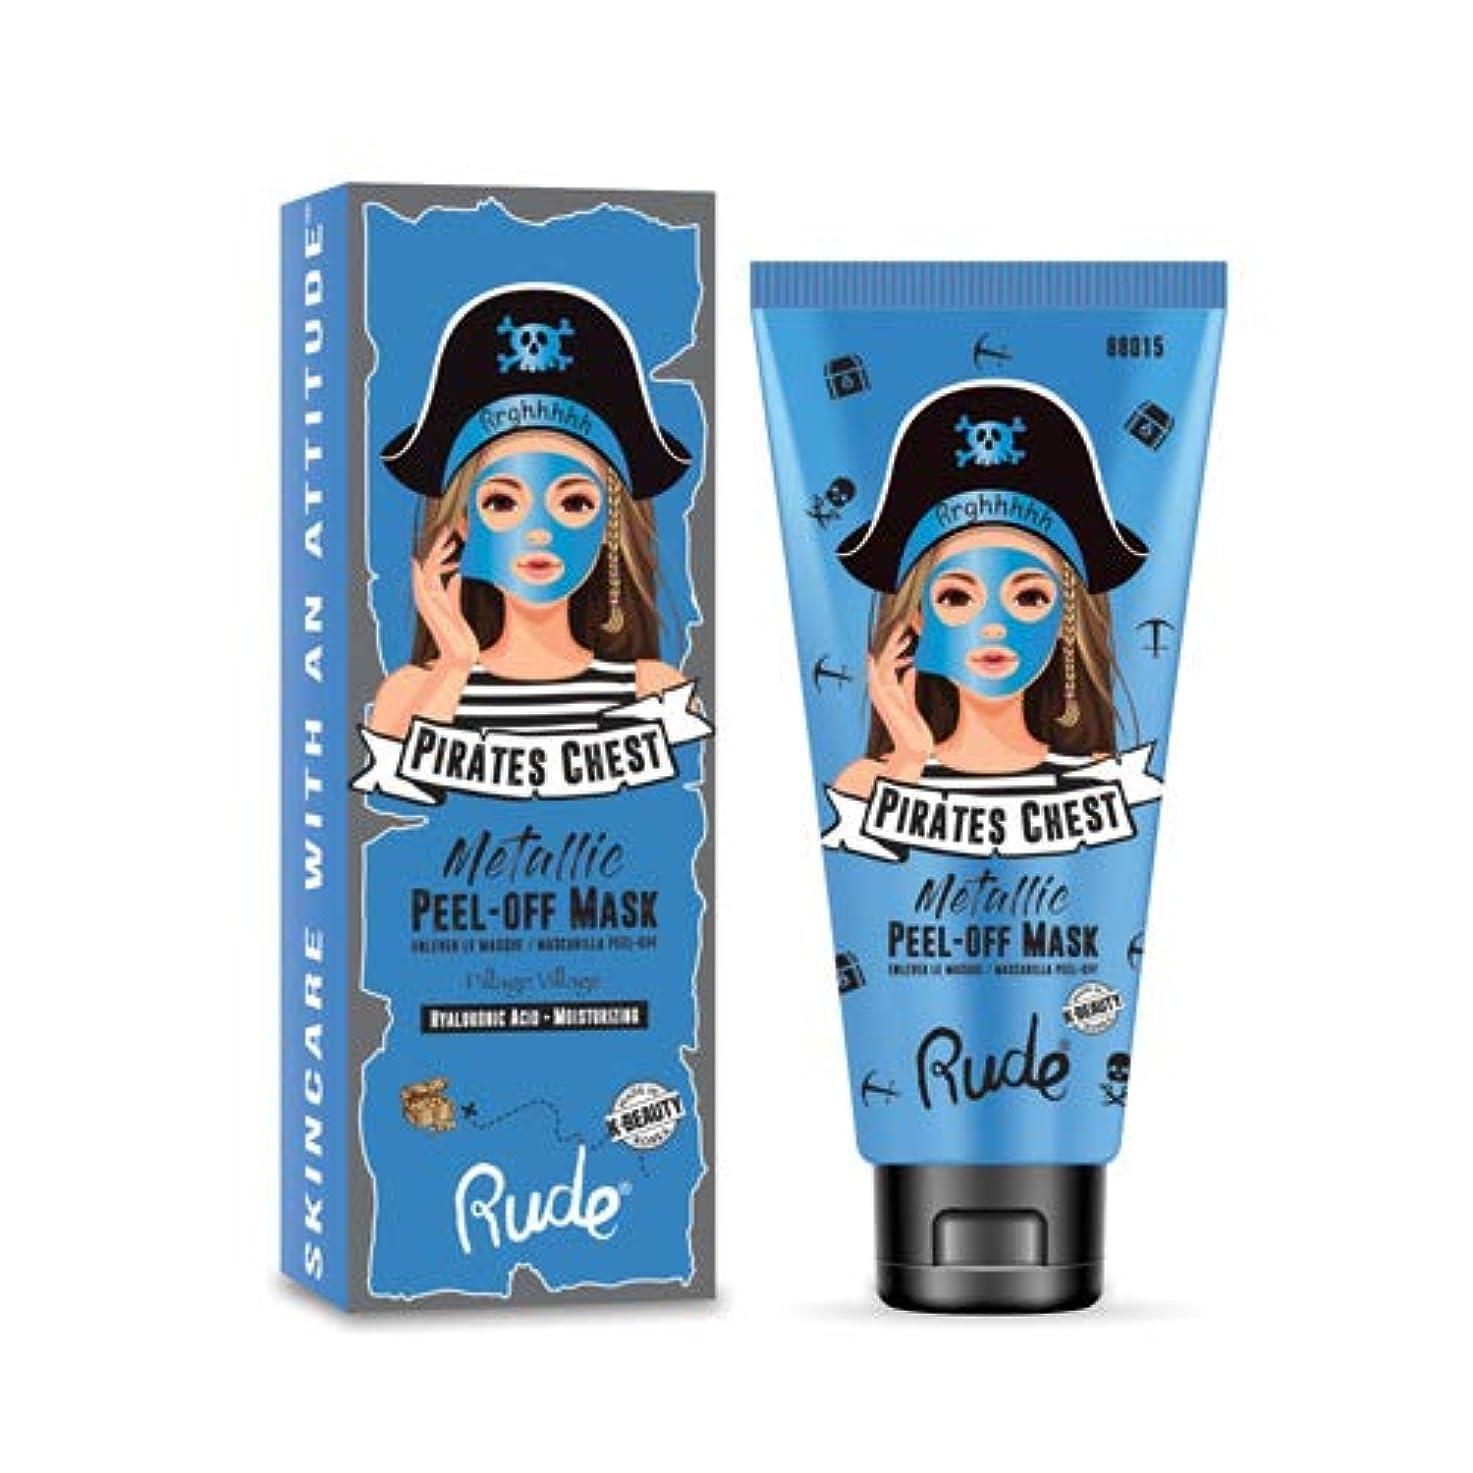 哲学全能本物(3 Pack) RUDE? Pirate's Chest Metallic Peel-off Mask - Pillage Village (並行輸入品)